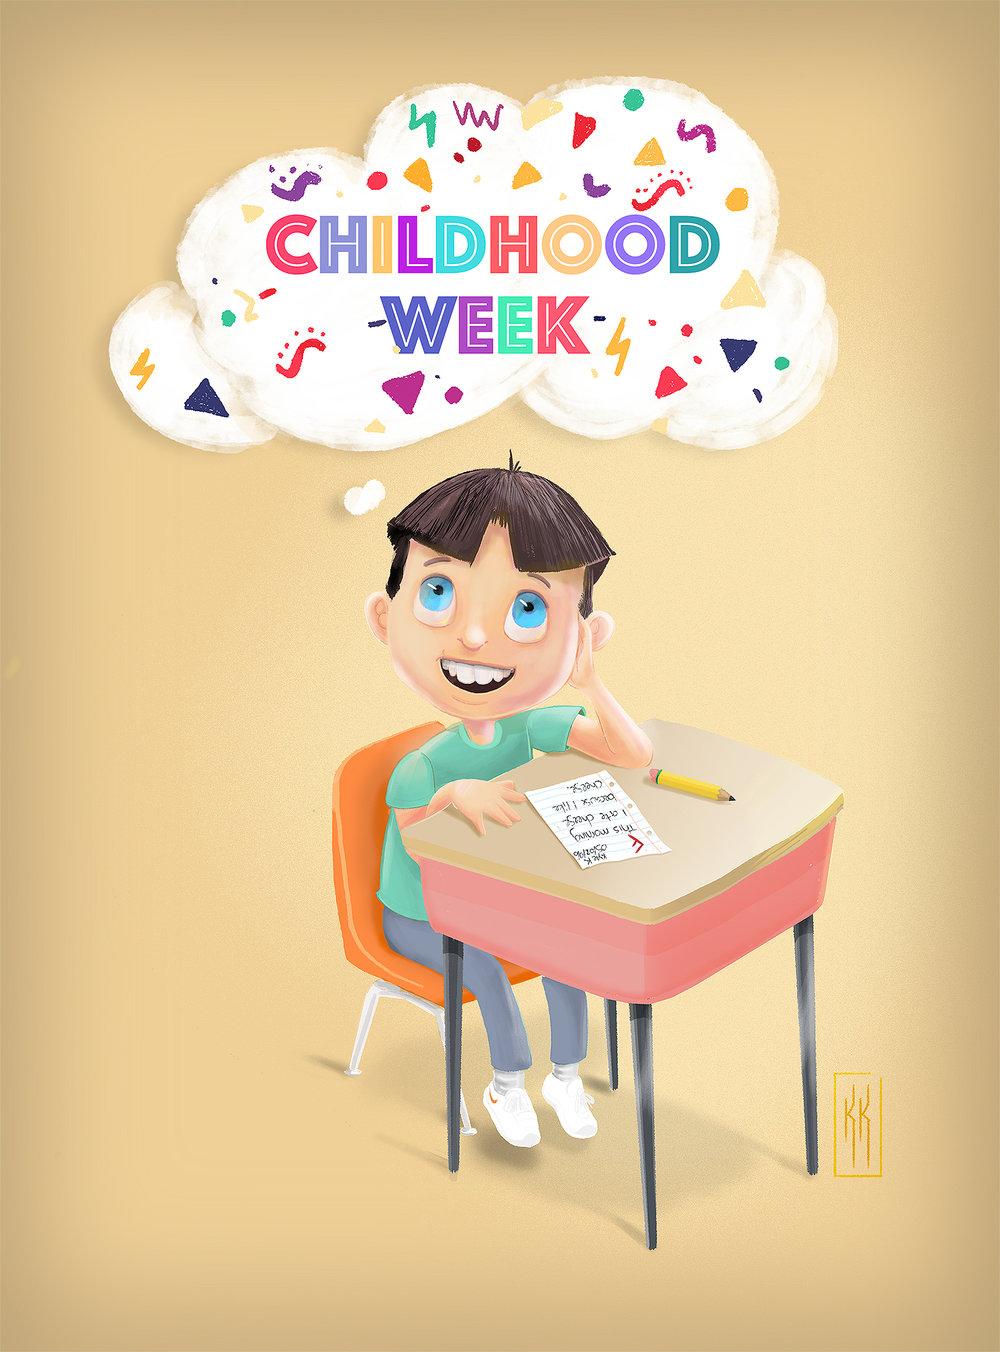 childhoodweek_00.JPG